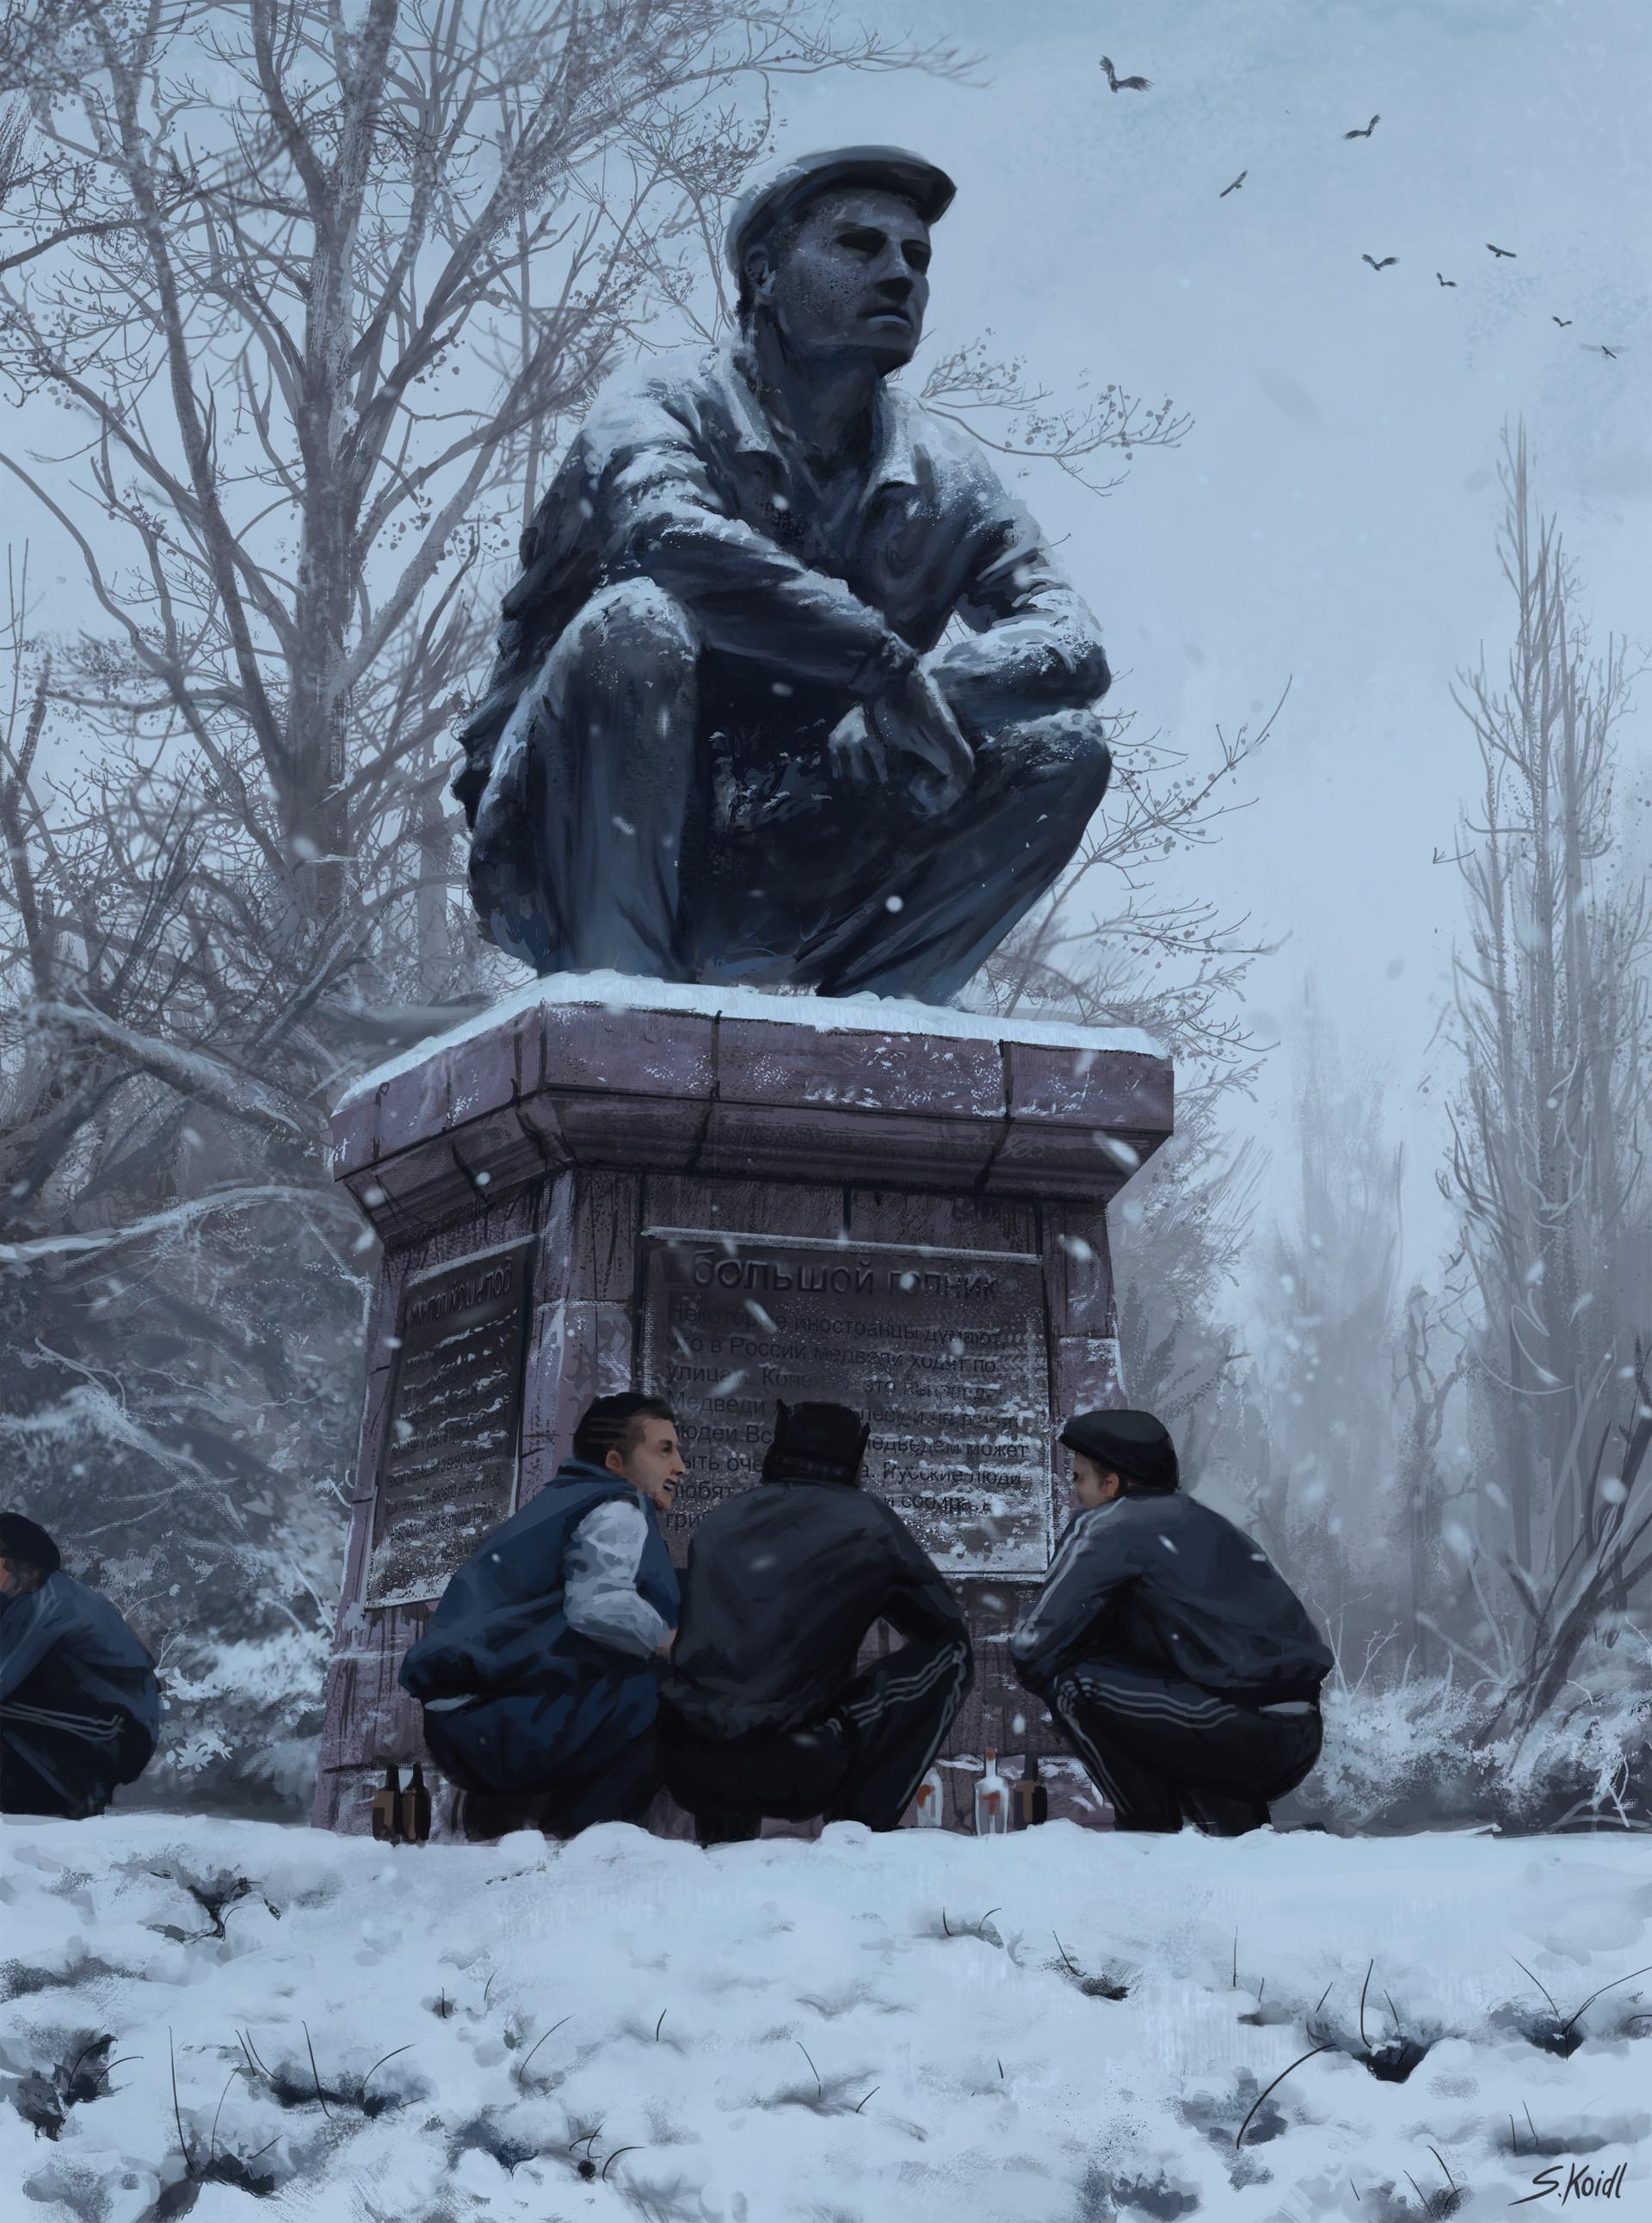 Gopnik (squatting slavs) Stefan-koidl-gopnik-town-4